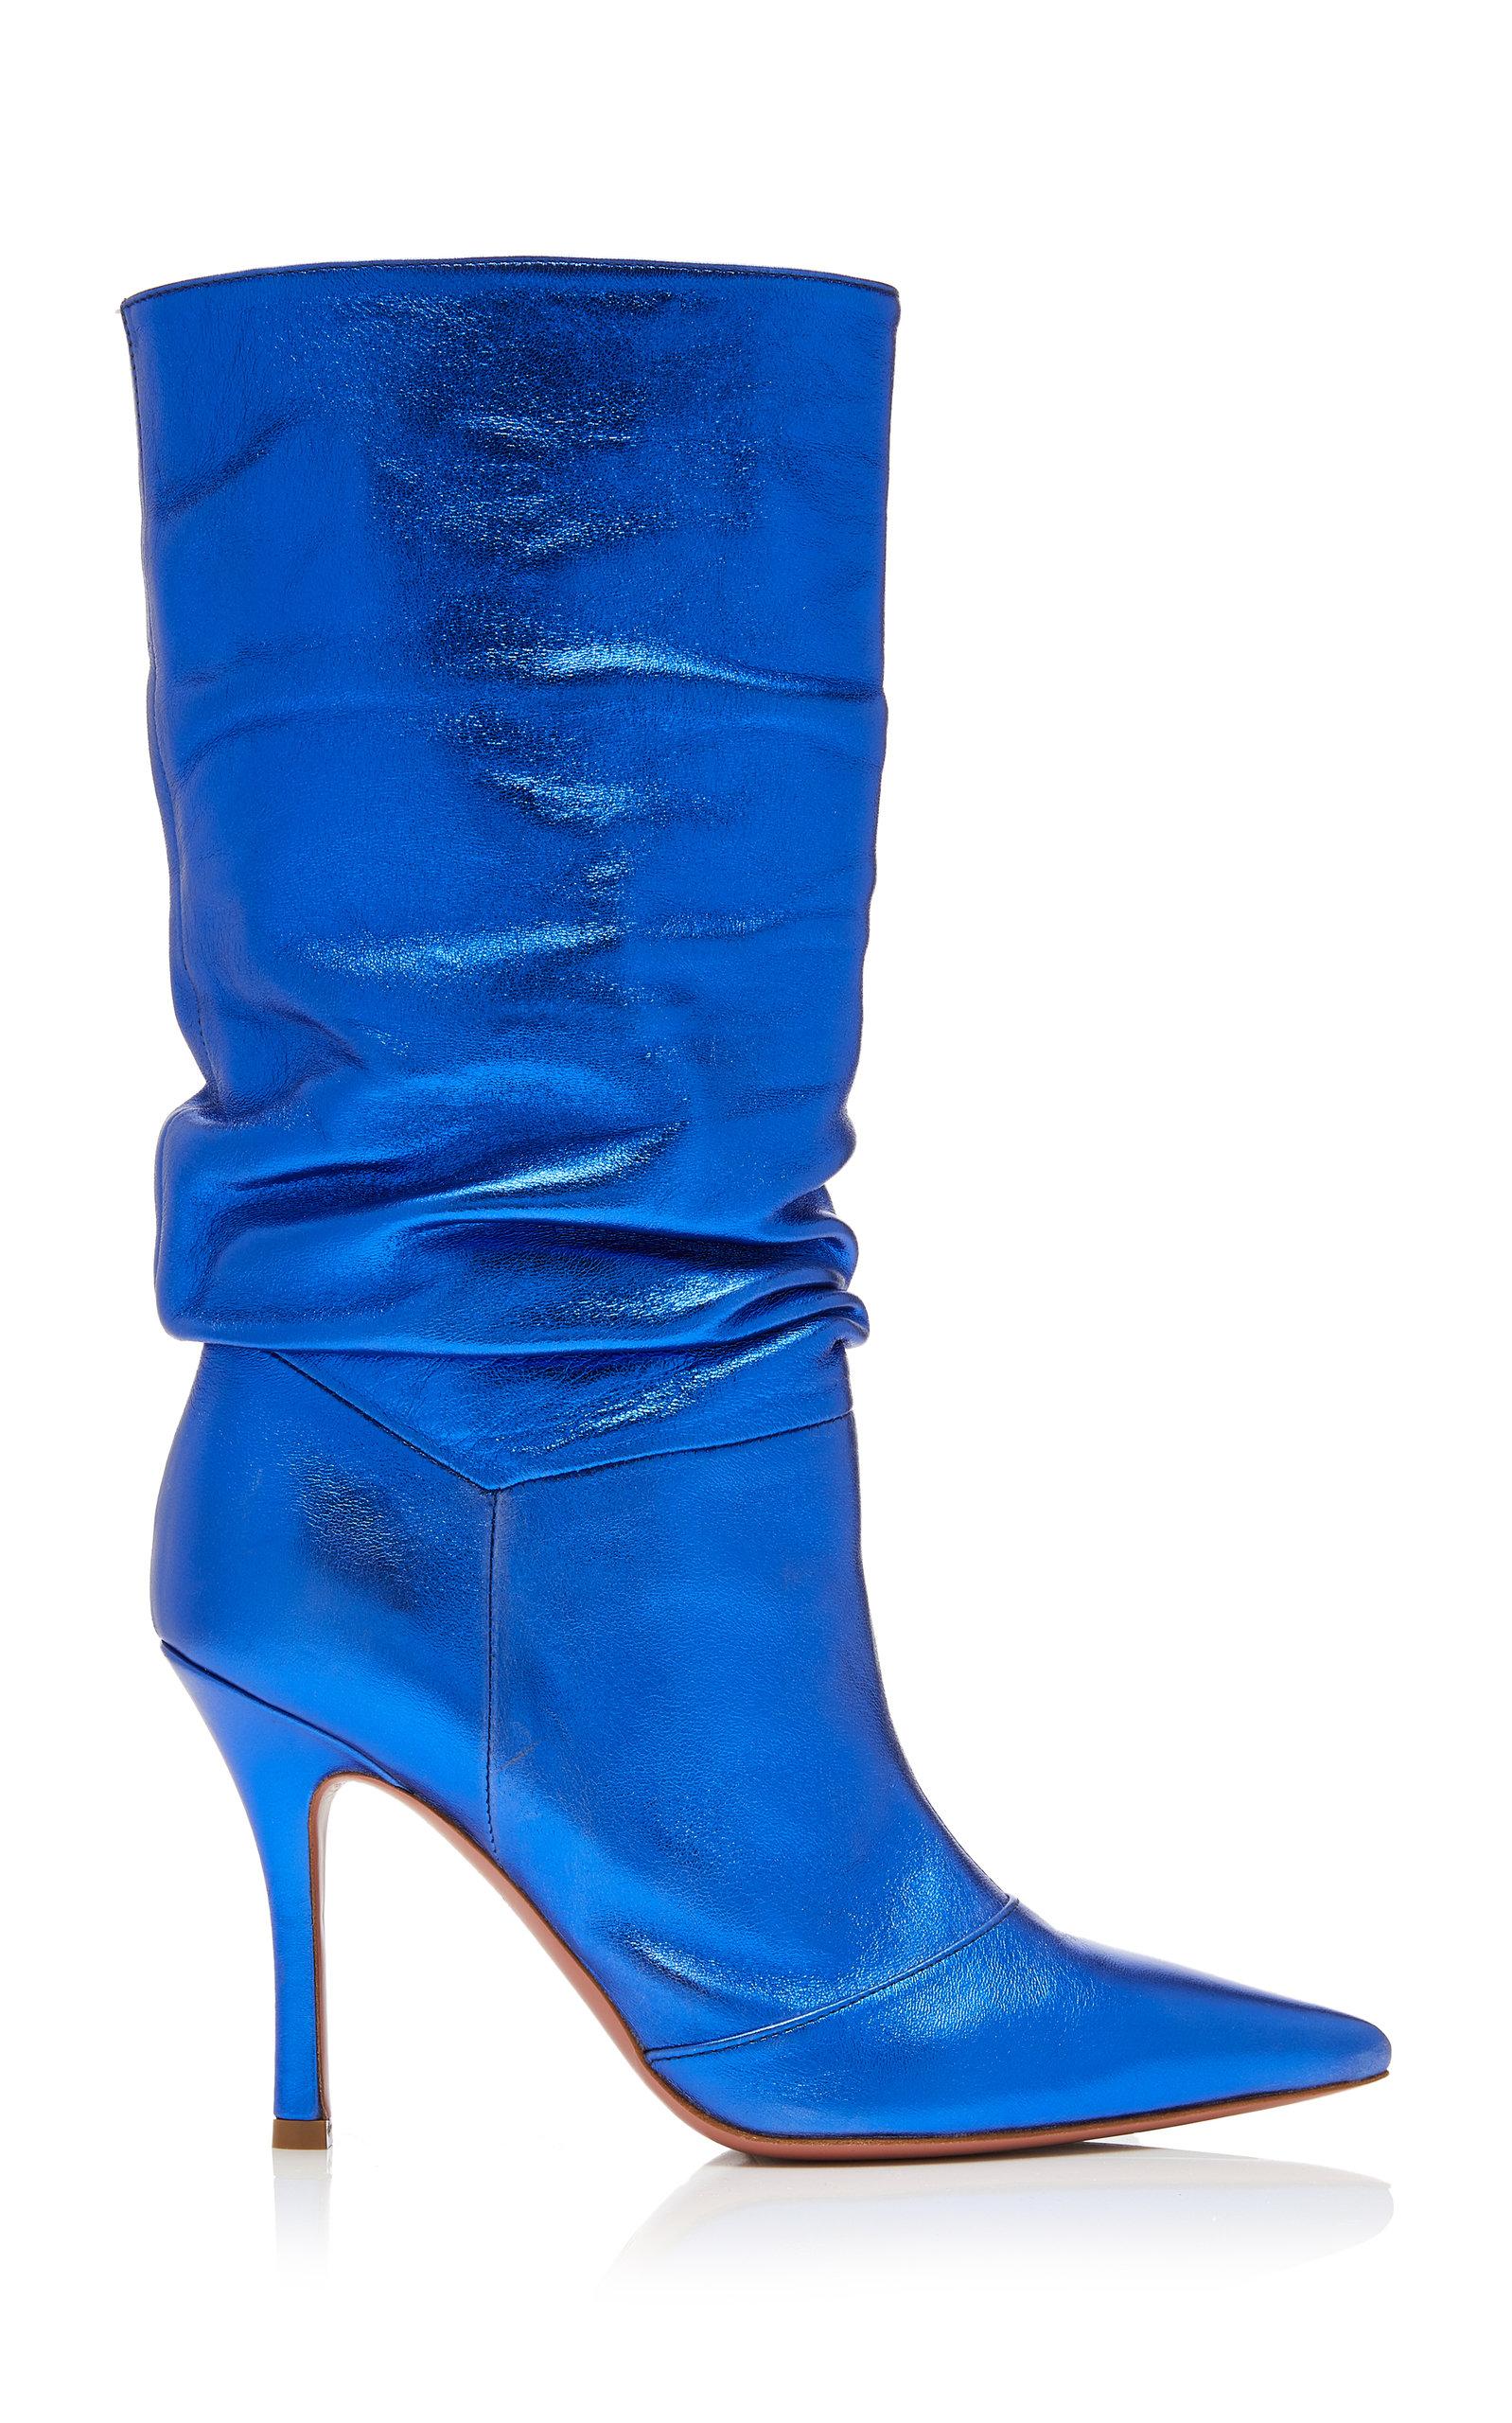 Amina Muaddi – Women's Ida Metallic Leather Knee Boots – Blue – Moda Operandi